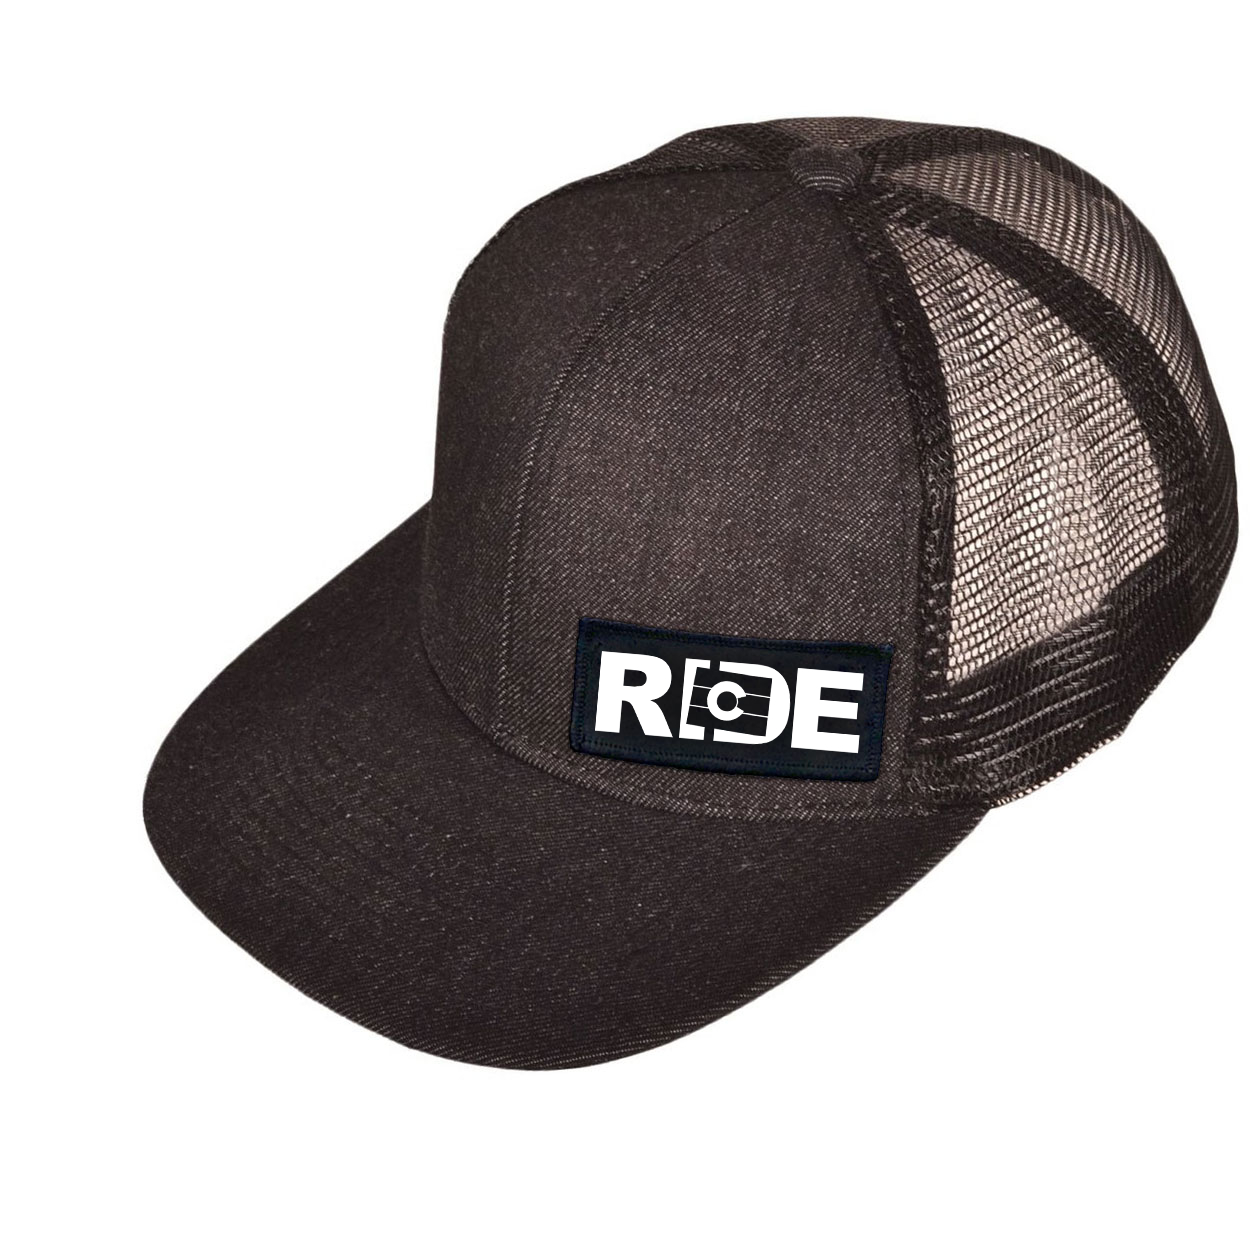 Ride Colorado Night Out Woven Patch Snapback Flat Brim Hat Black Denim (White Logo)